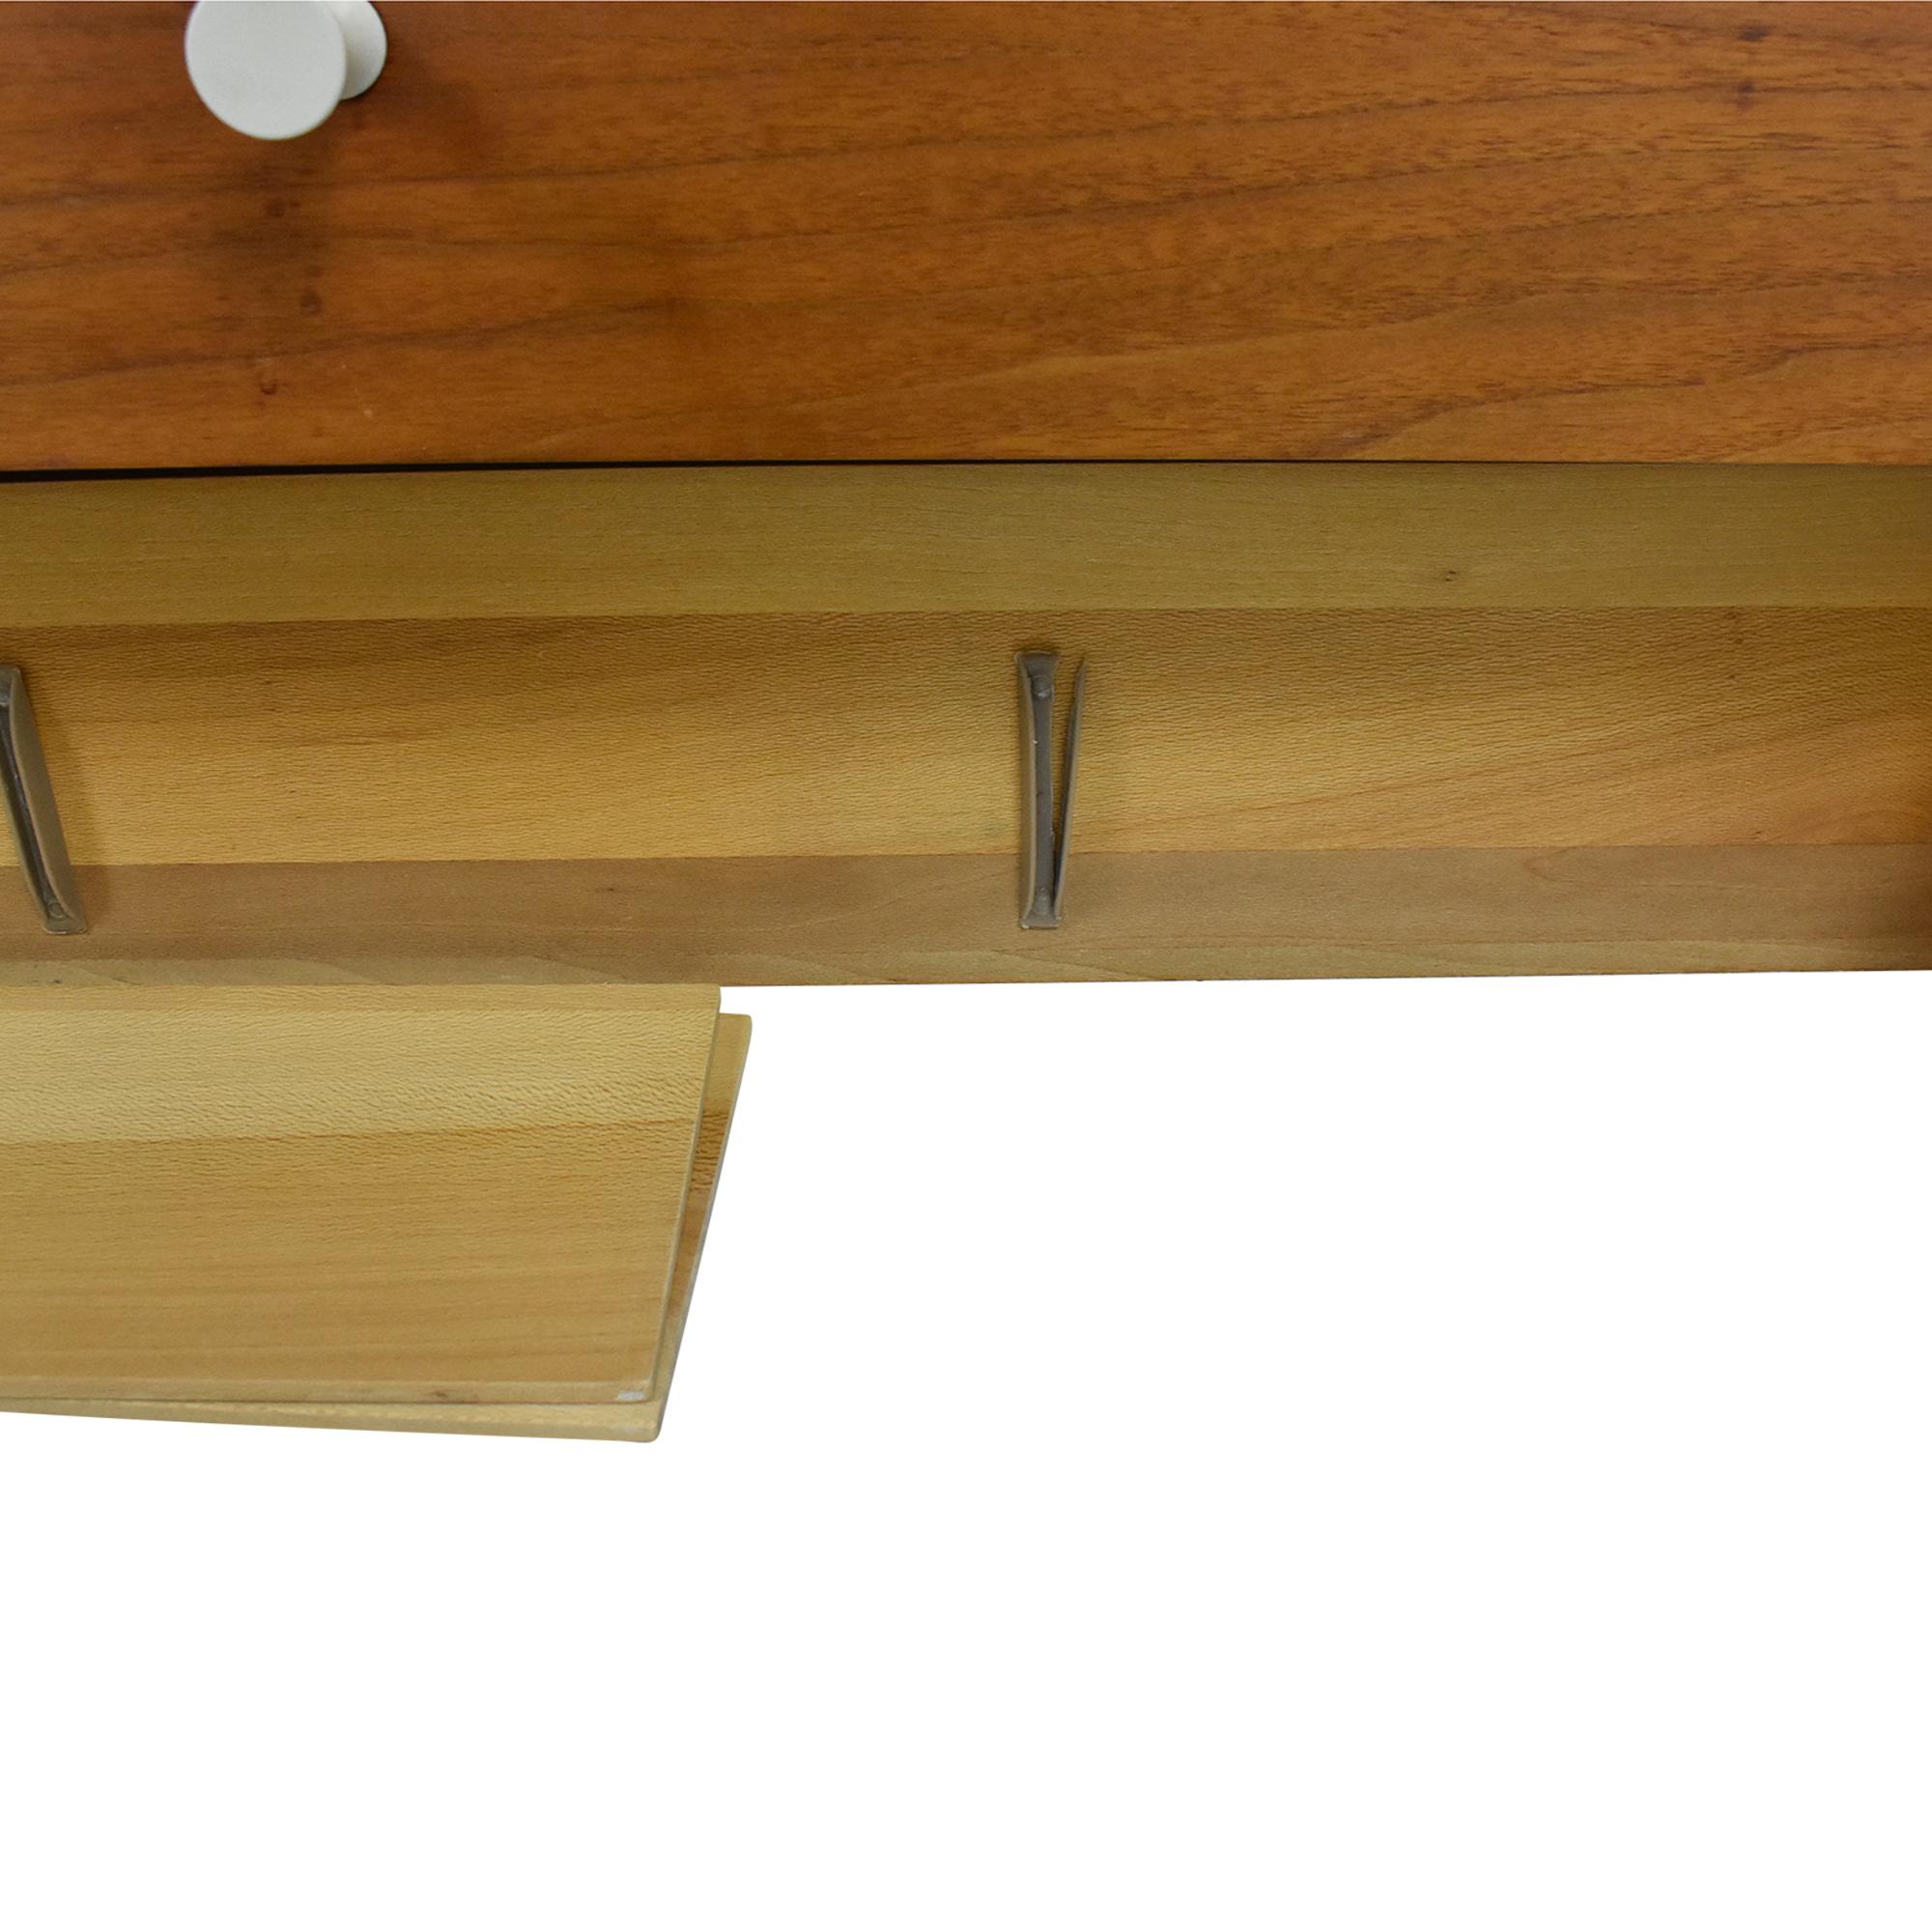 Herman Miller Herman Miller George Nelson Thin Edge Double Dresser second hand